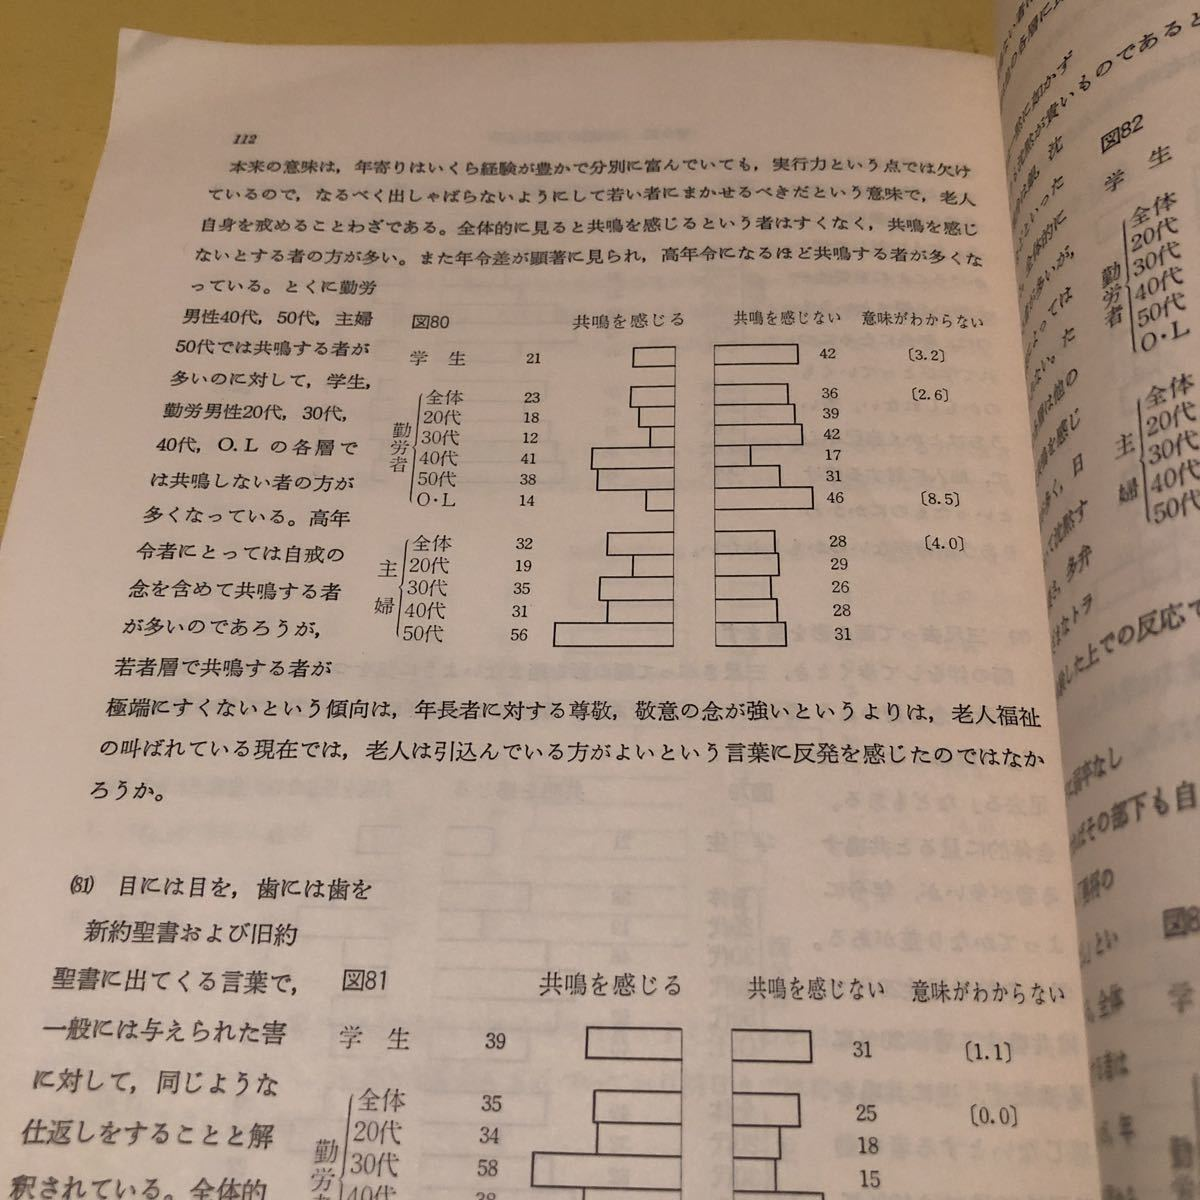 2001☆か20☆ 日本人の価値観の構造と変容 調査と資料 第20号 生活価値観研究班 関西大学経済政治研究所 昭和51年発行_画像6